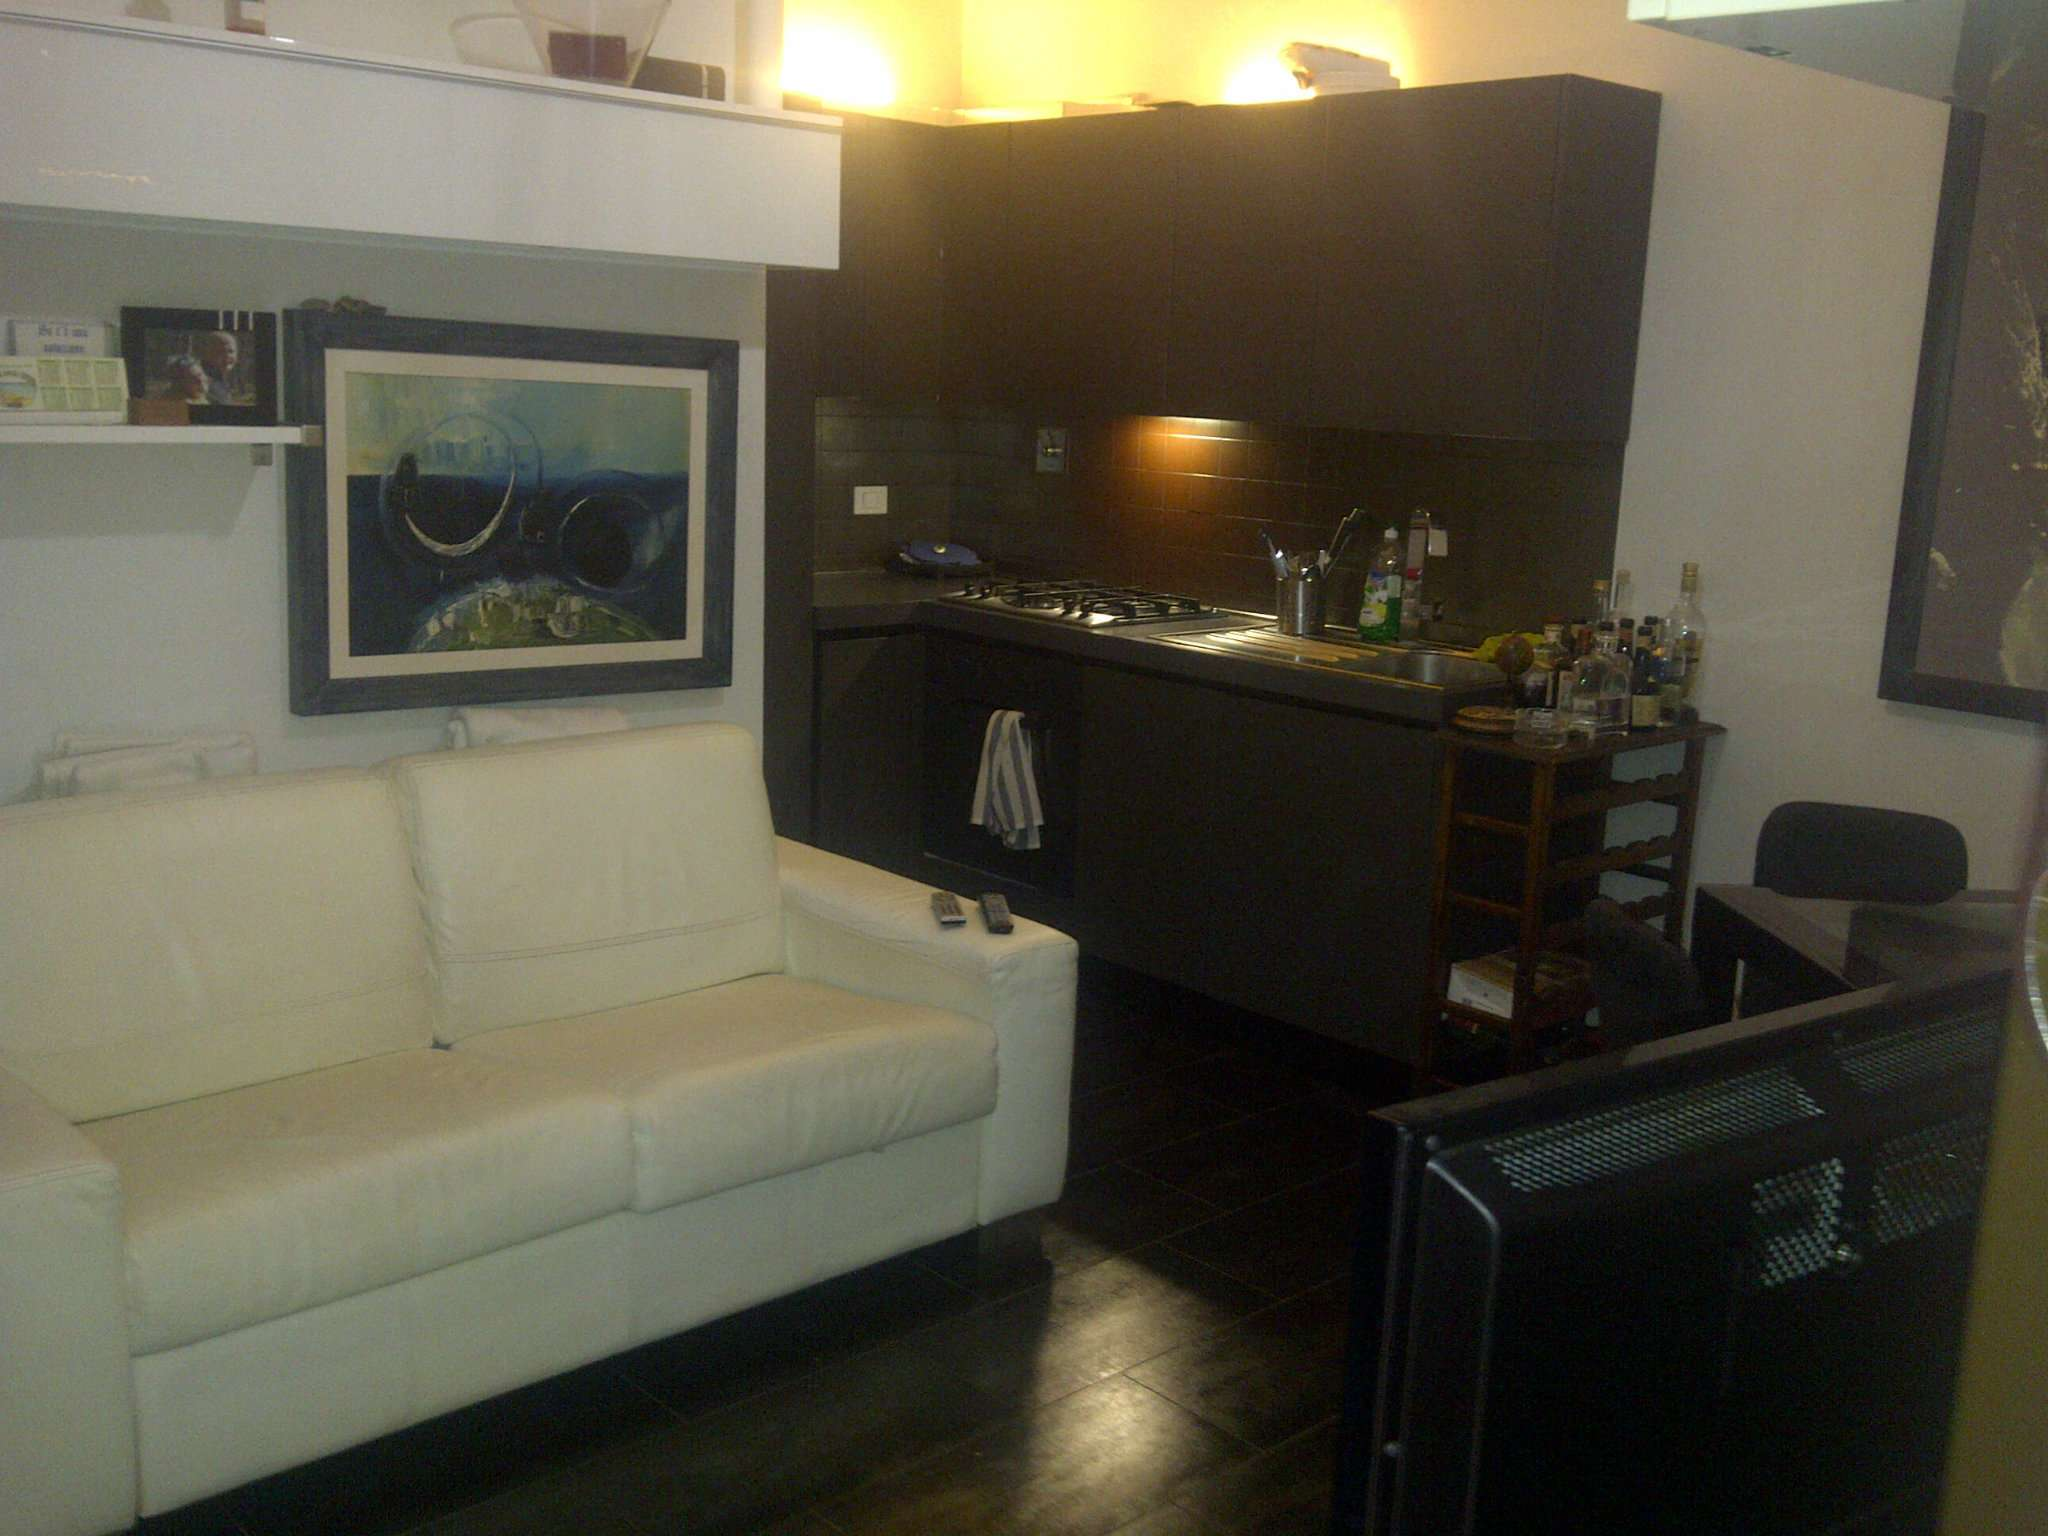 Appartamento in Vendita a Firenze Periferia Nord:  2 locali, 50 mq  - Foto 1